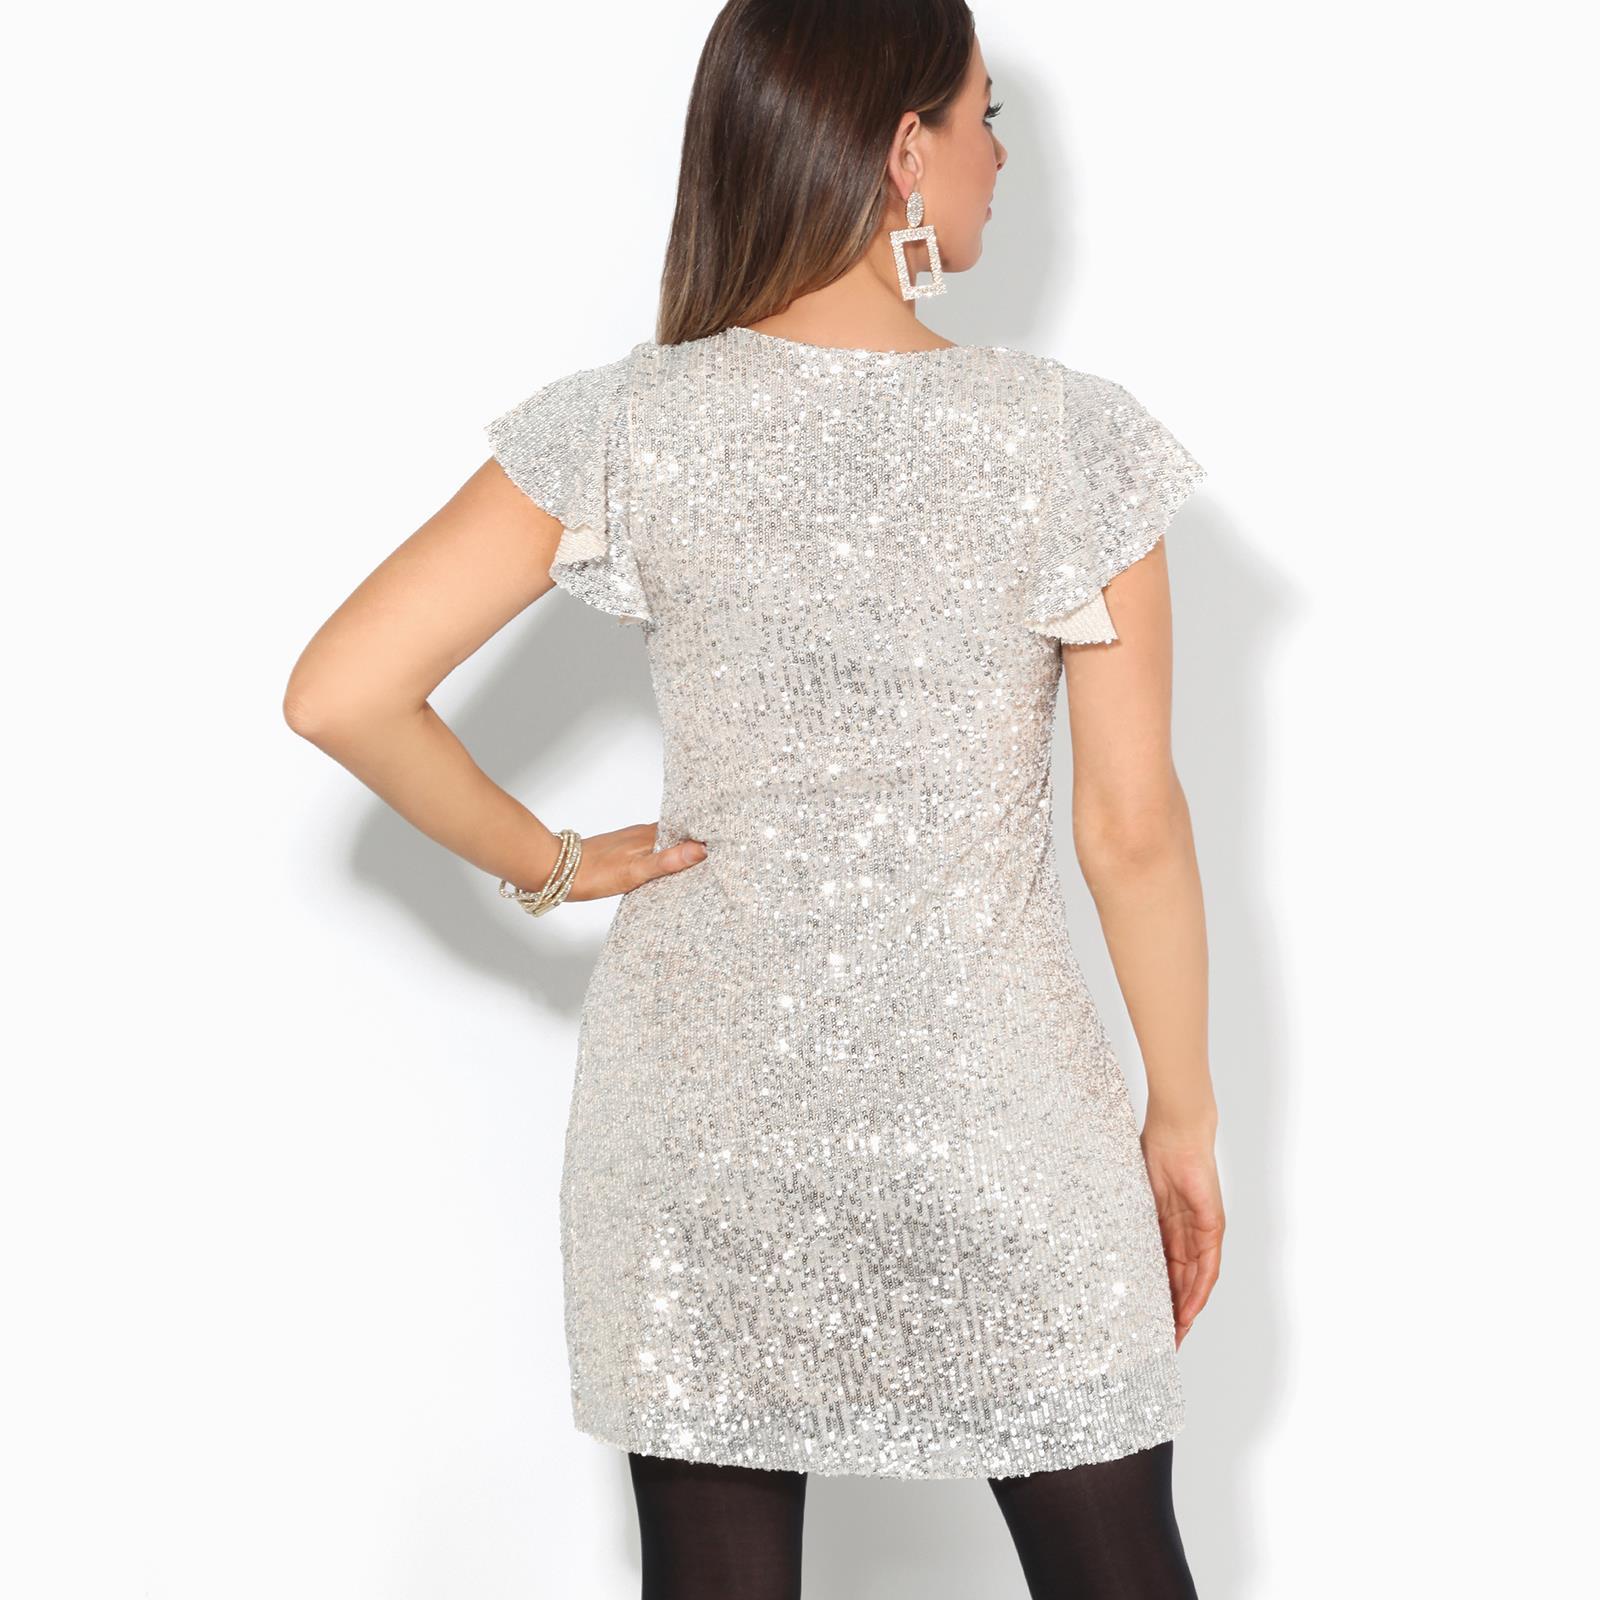 Womens-Ladies-Sequin-Glitter-Dress-Party-Ruffle-Sleeve-Evening-Lurex-Tunic-Top thumbnail 7